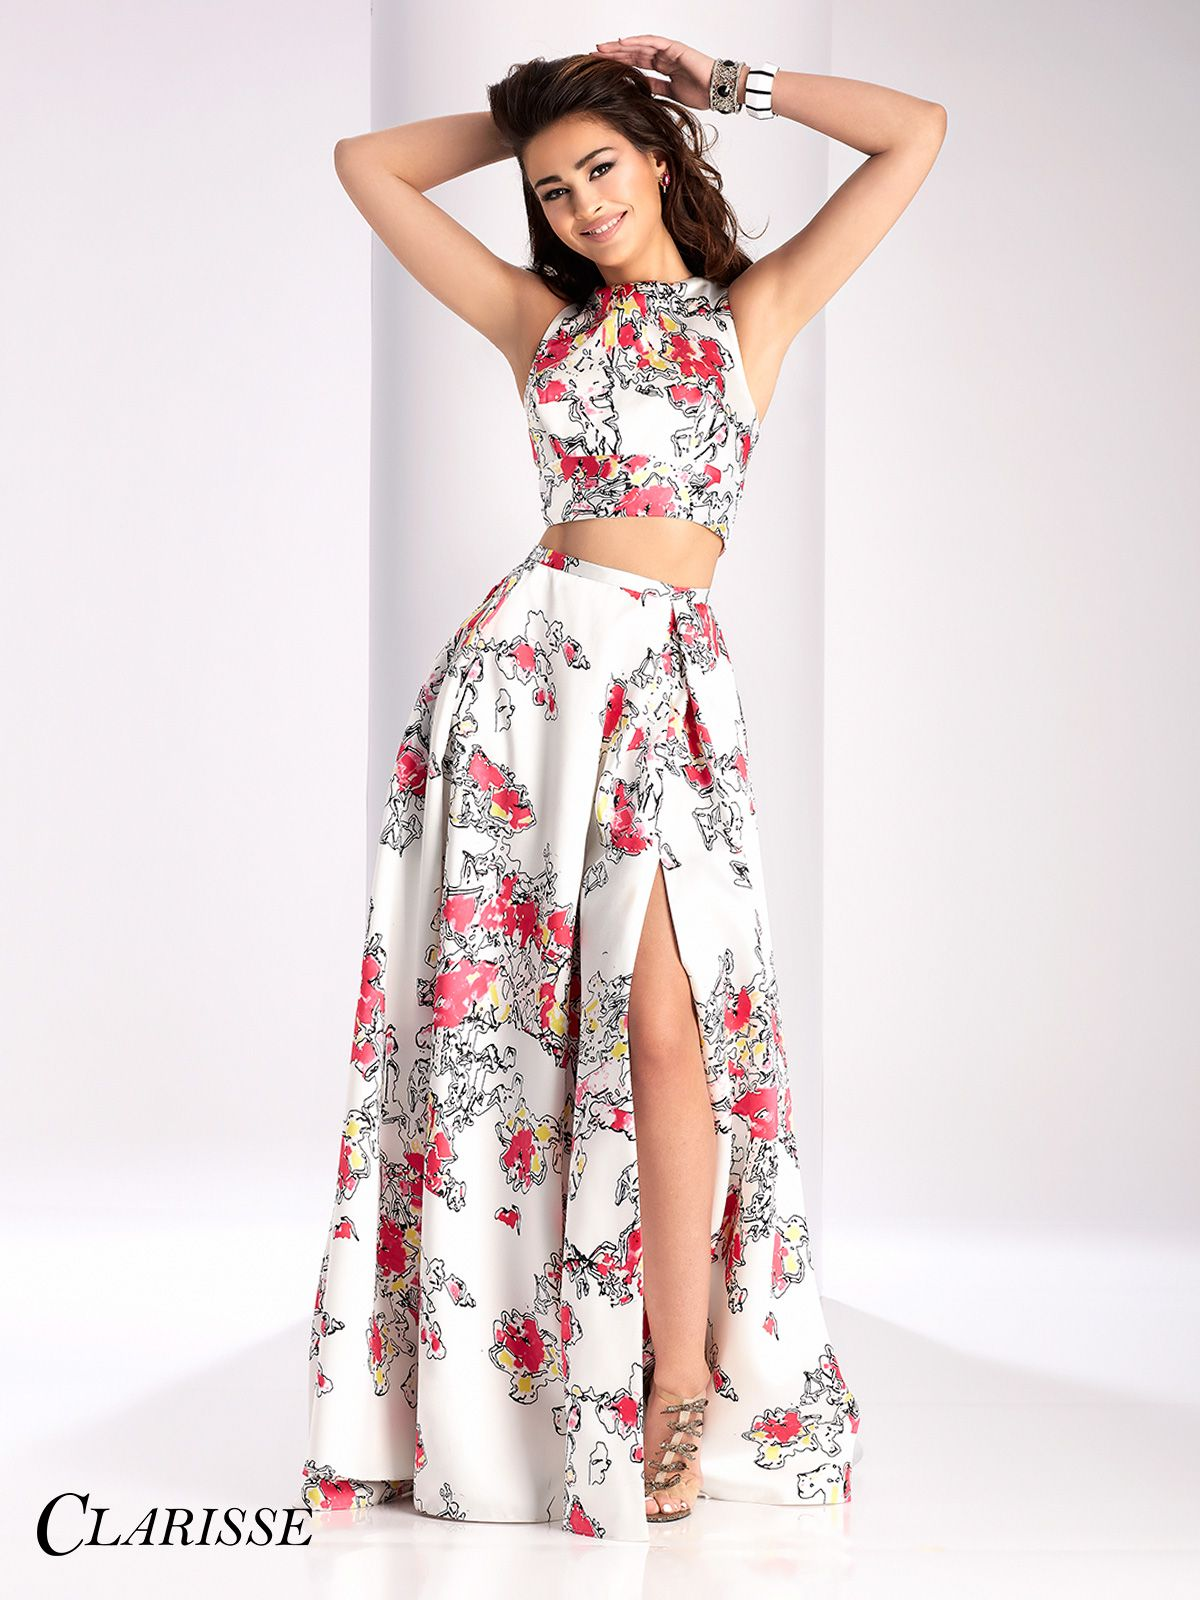 Clarisse Two Piece Print Prom Dress 3002  Unique prom